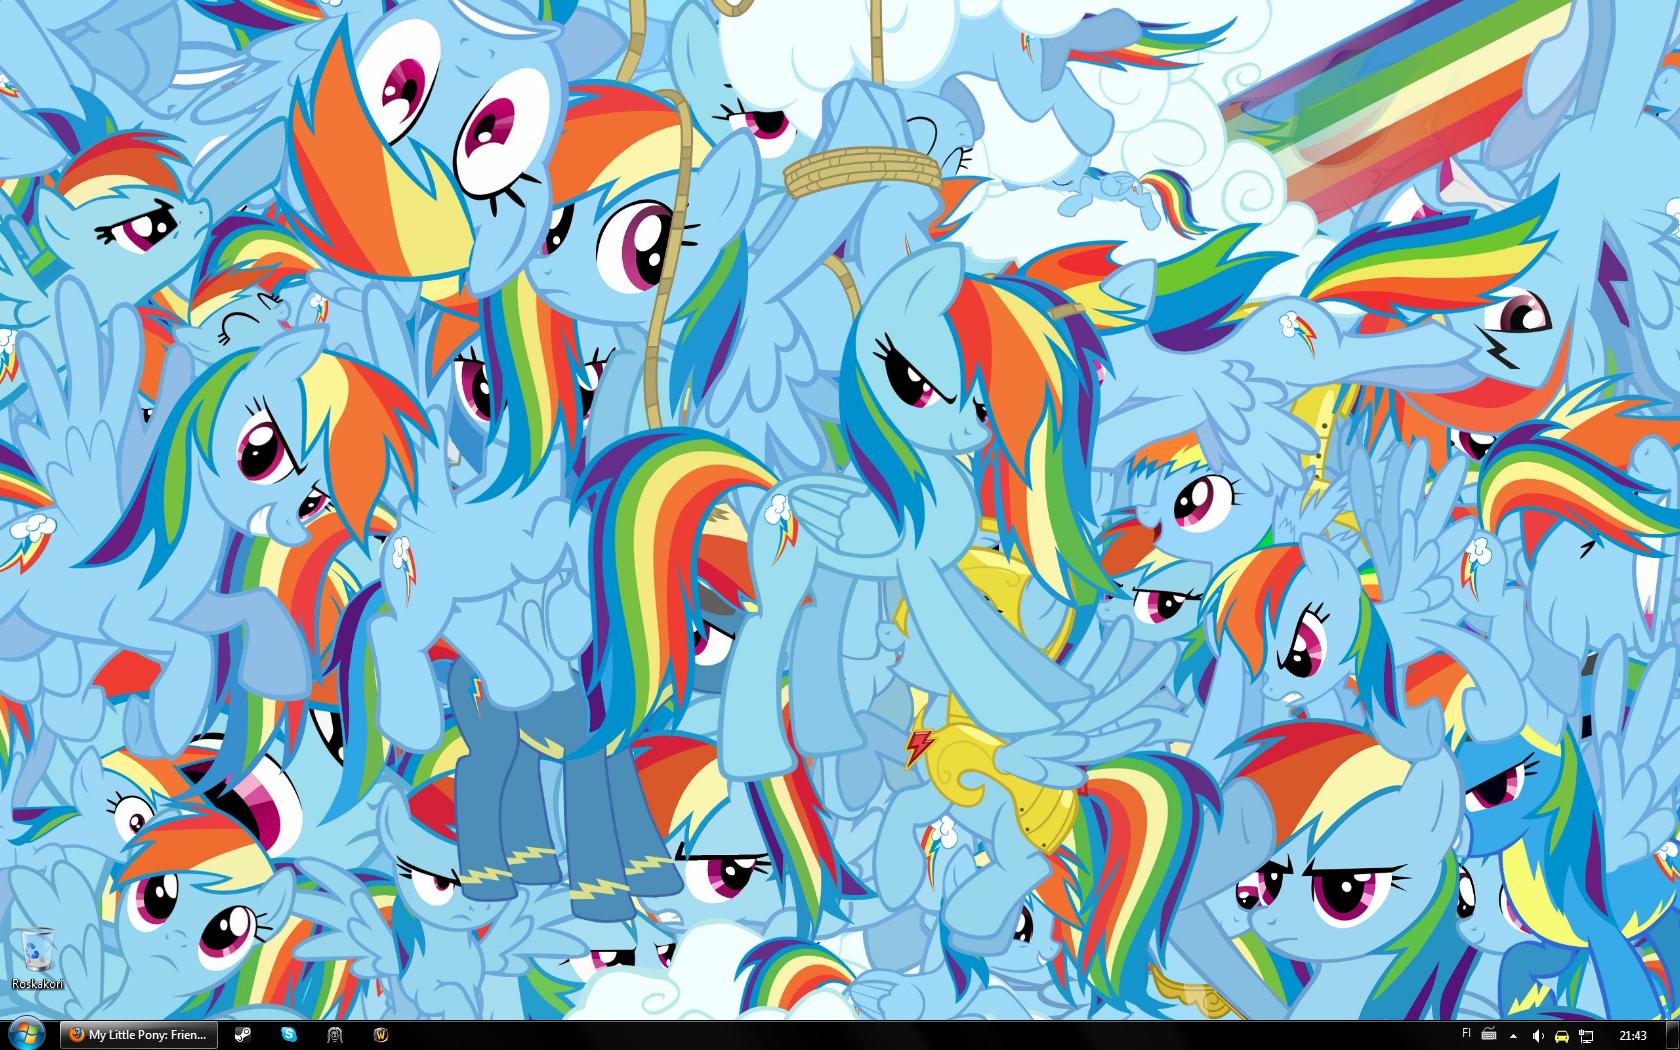 my little pony friendship is magic Full of Rainbow Dash